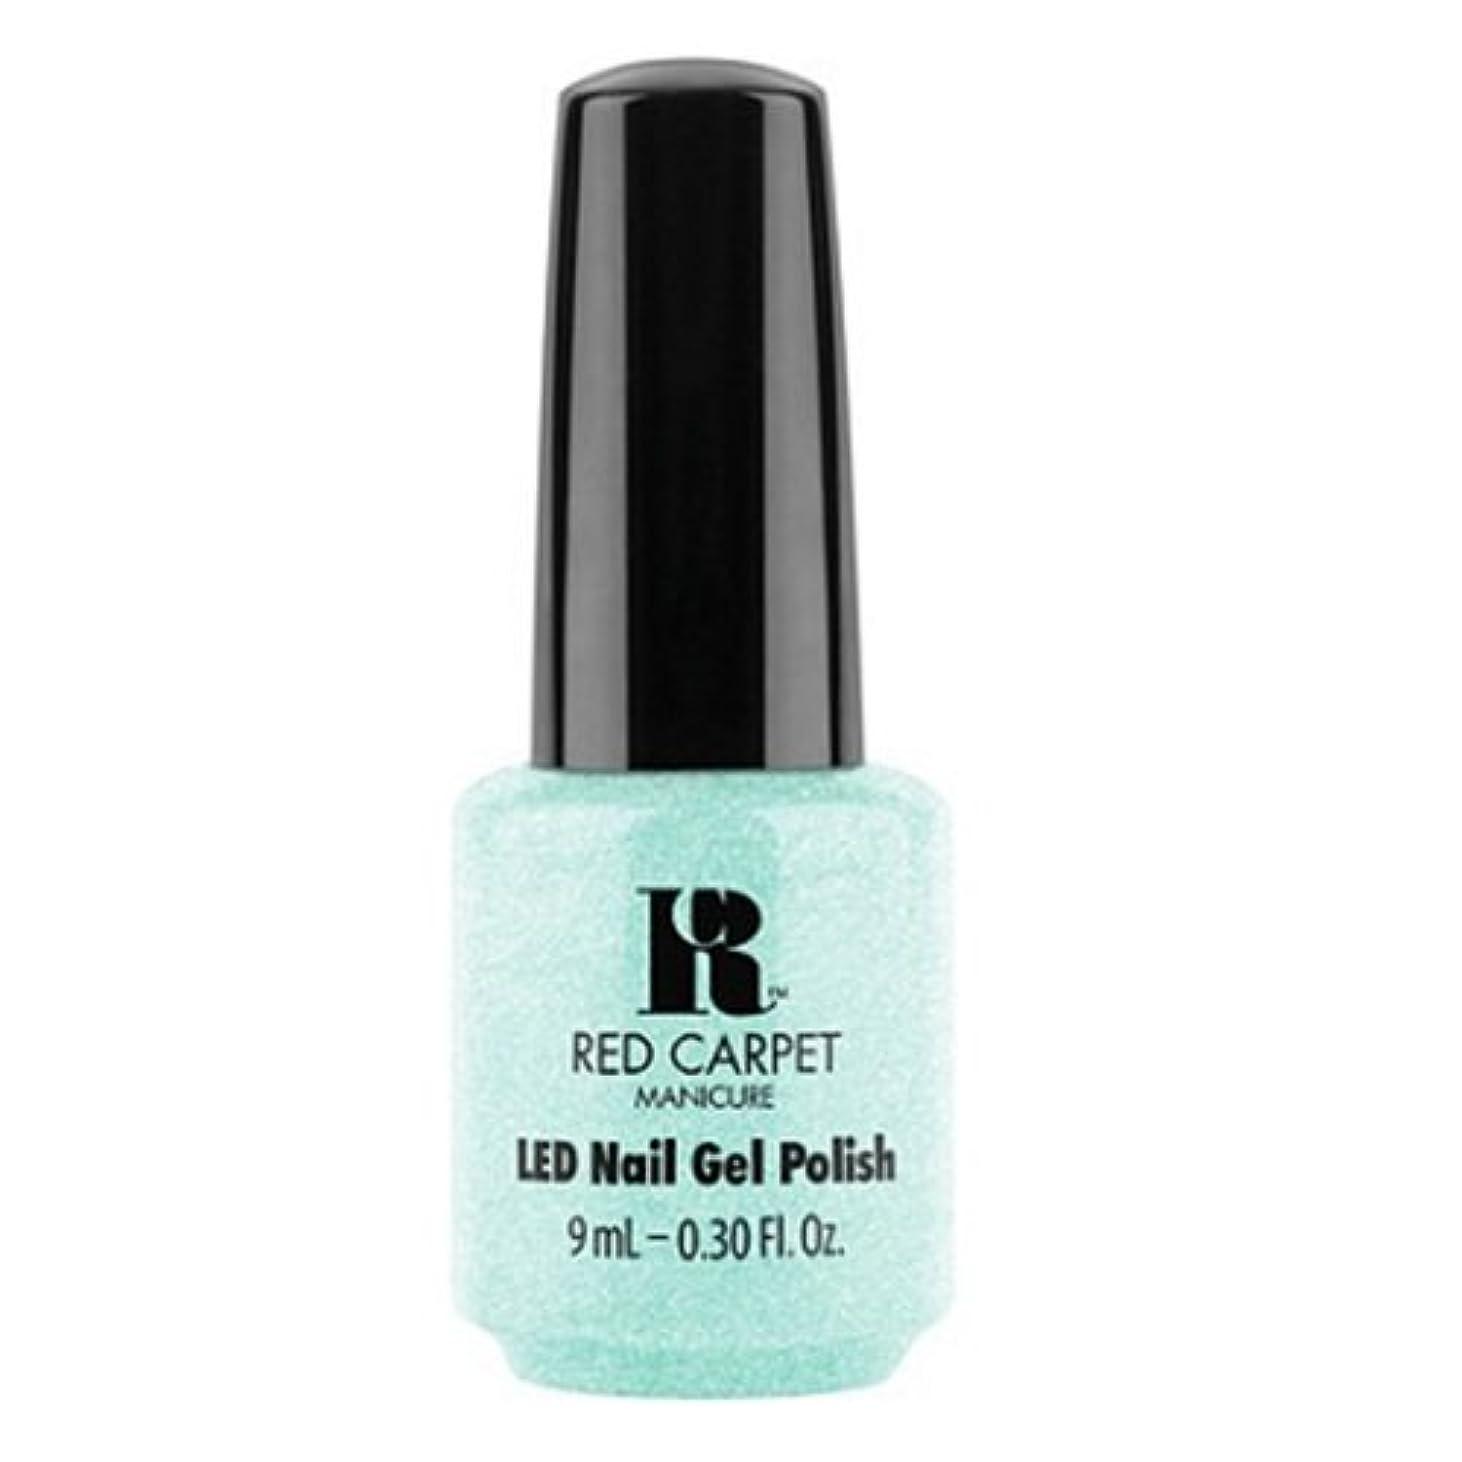 Red Carpet Manicure - LED Nail Gel Polish - Countdown to Fab - 0.3oz / 9ml